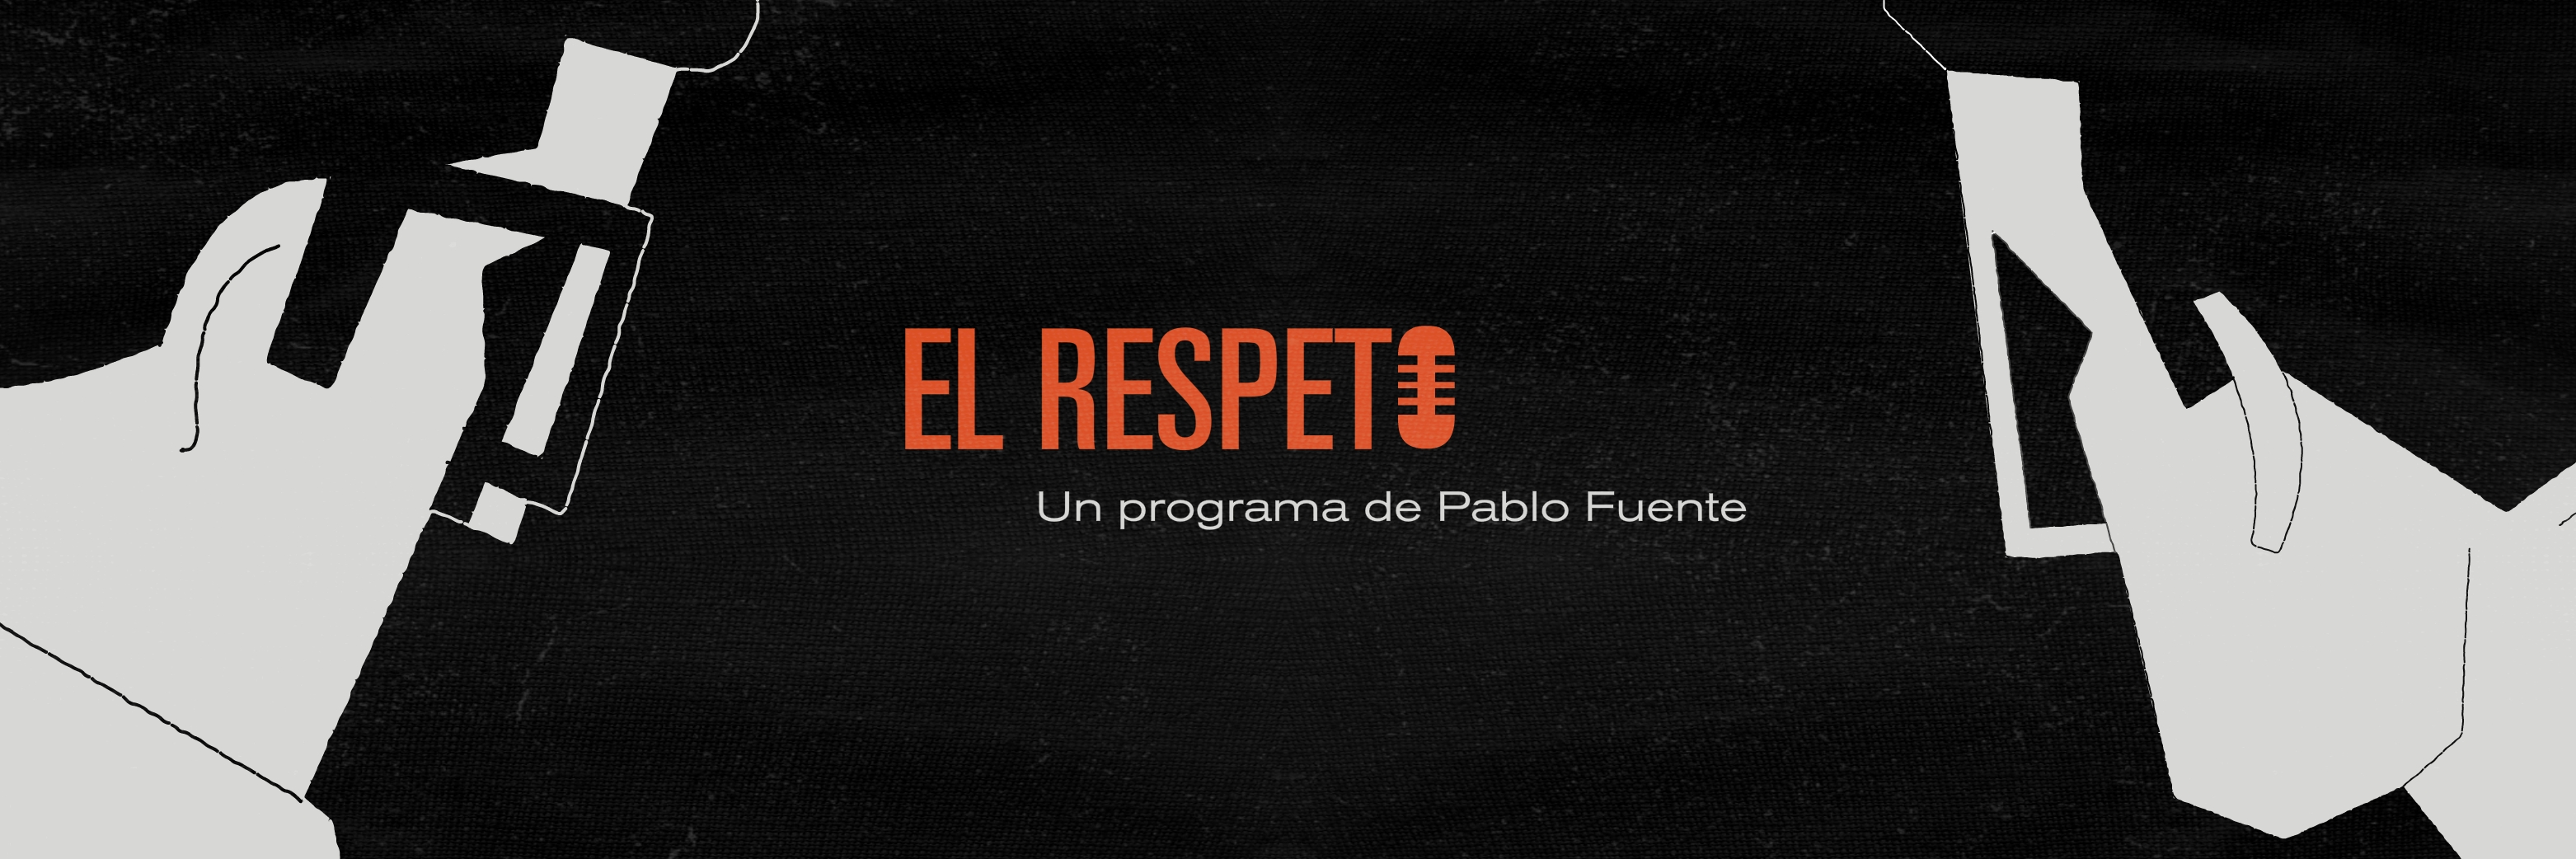 ELRESPETO_youtube1